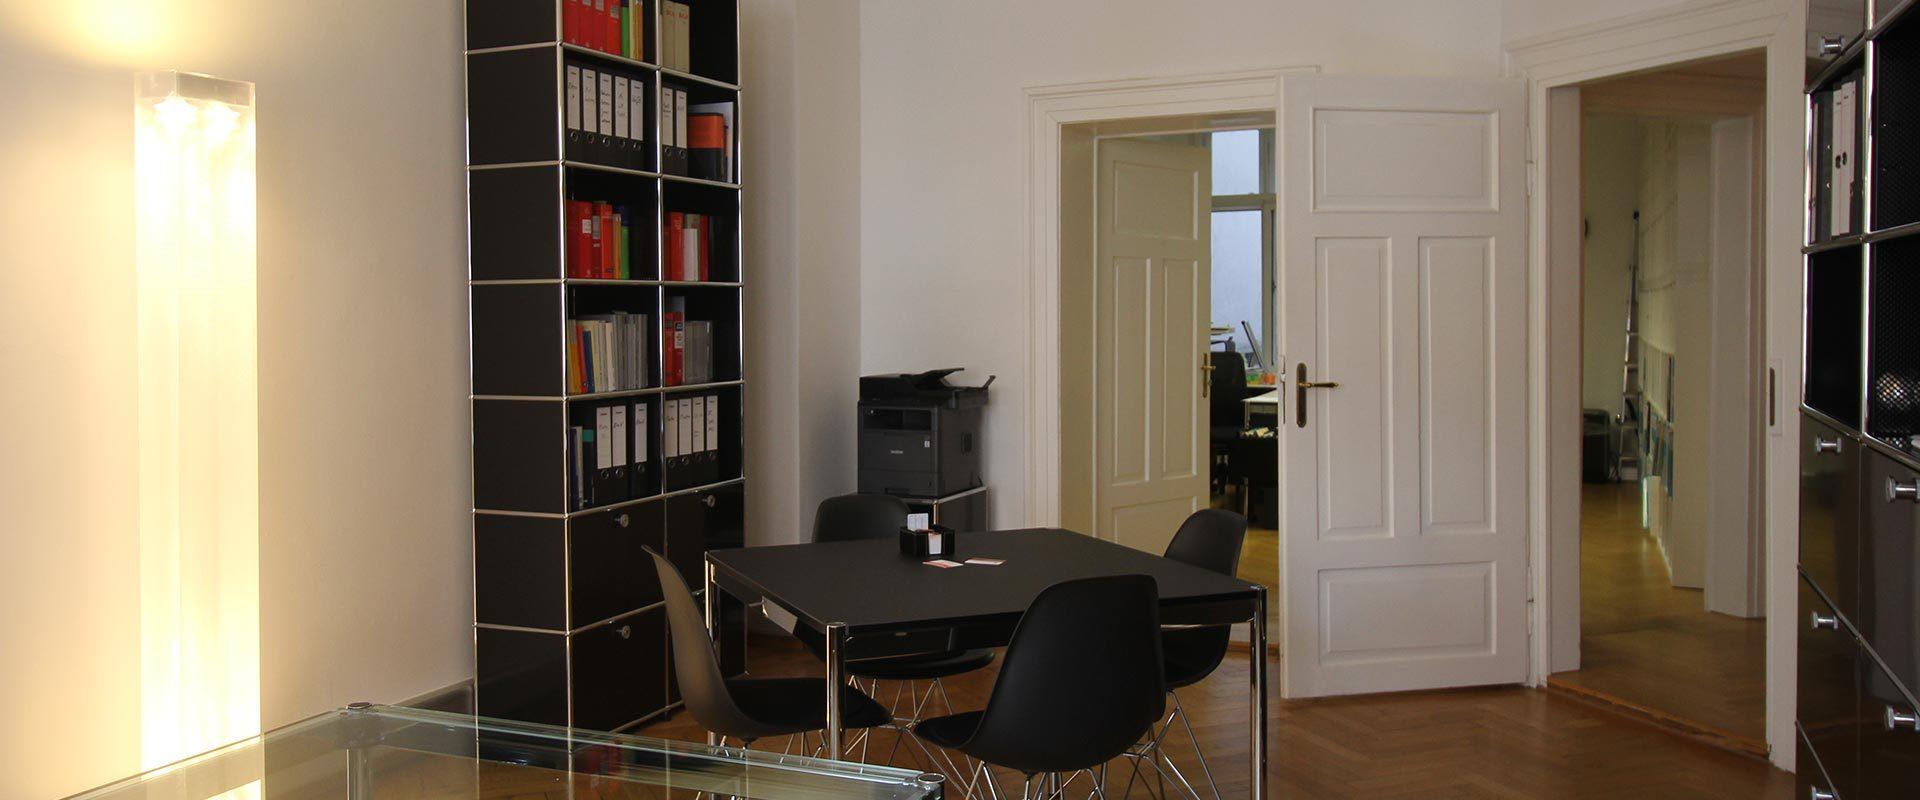 Rechtsanwaltskanzlei in Landshut